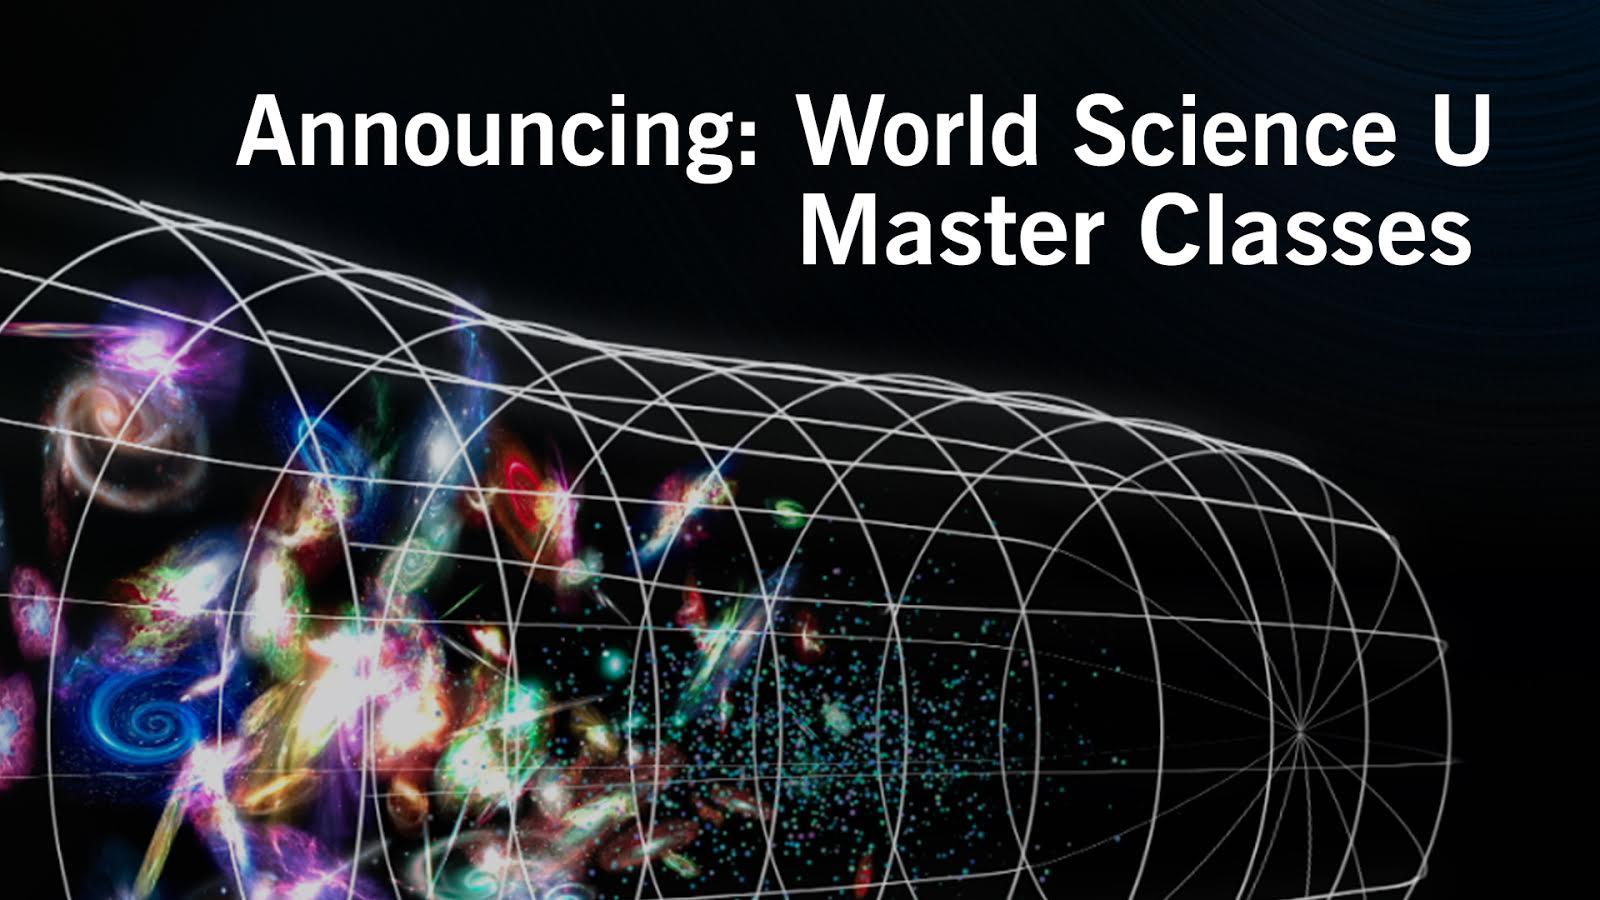 World Science U